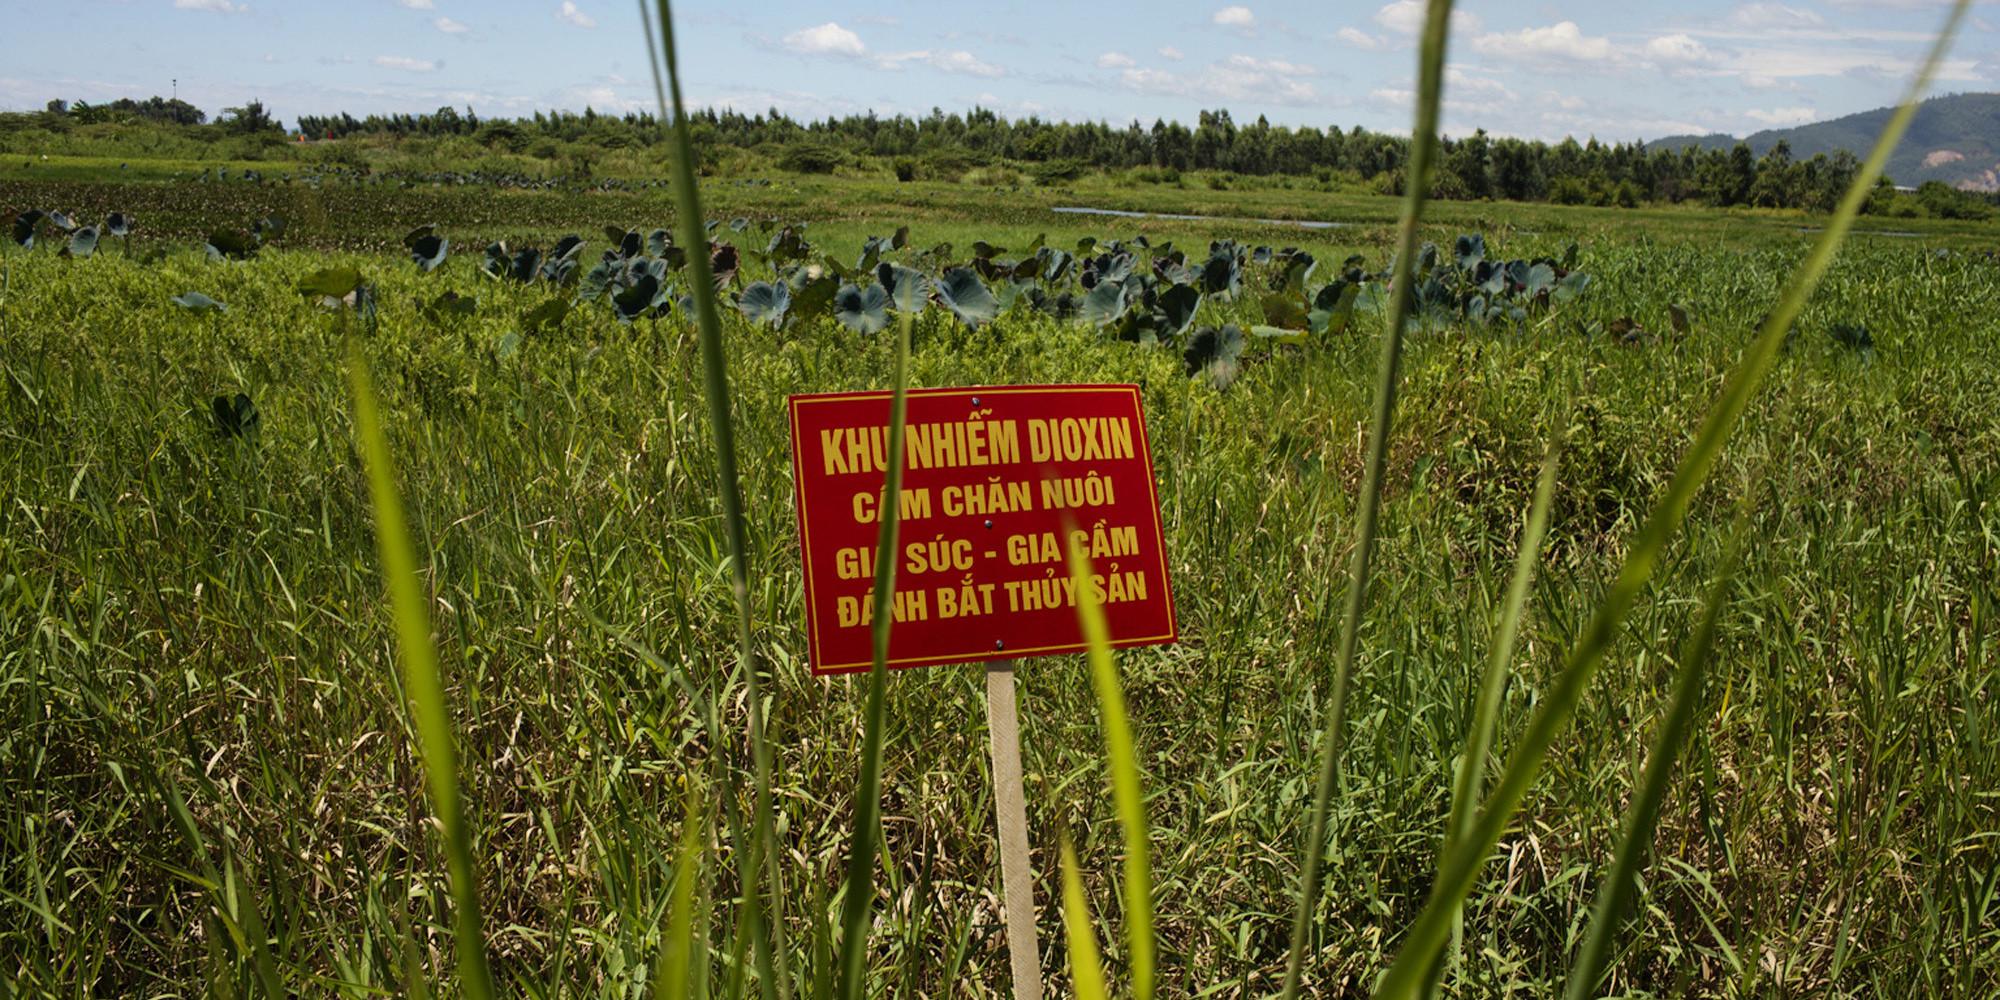 an introduction to the agent orange in the vietnam war Vietnam, us begin agent orange cleanup at former vietnam us dioxin agent orange vietnam war us begin agent orange cleanup at former wartime air base.